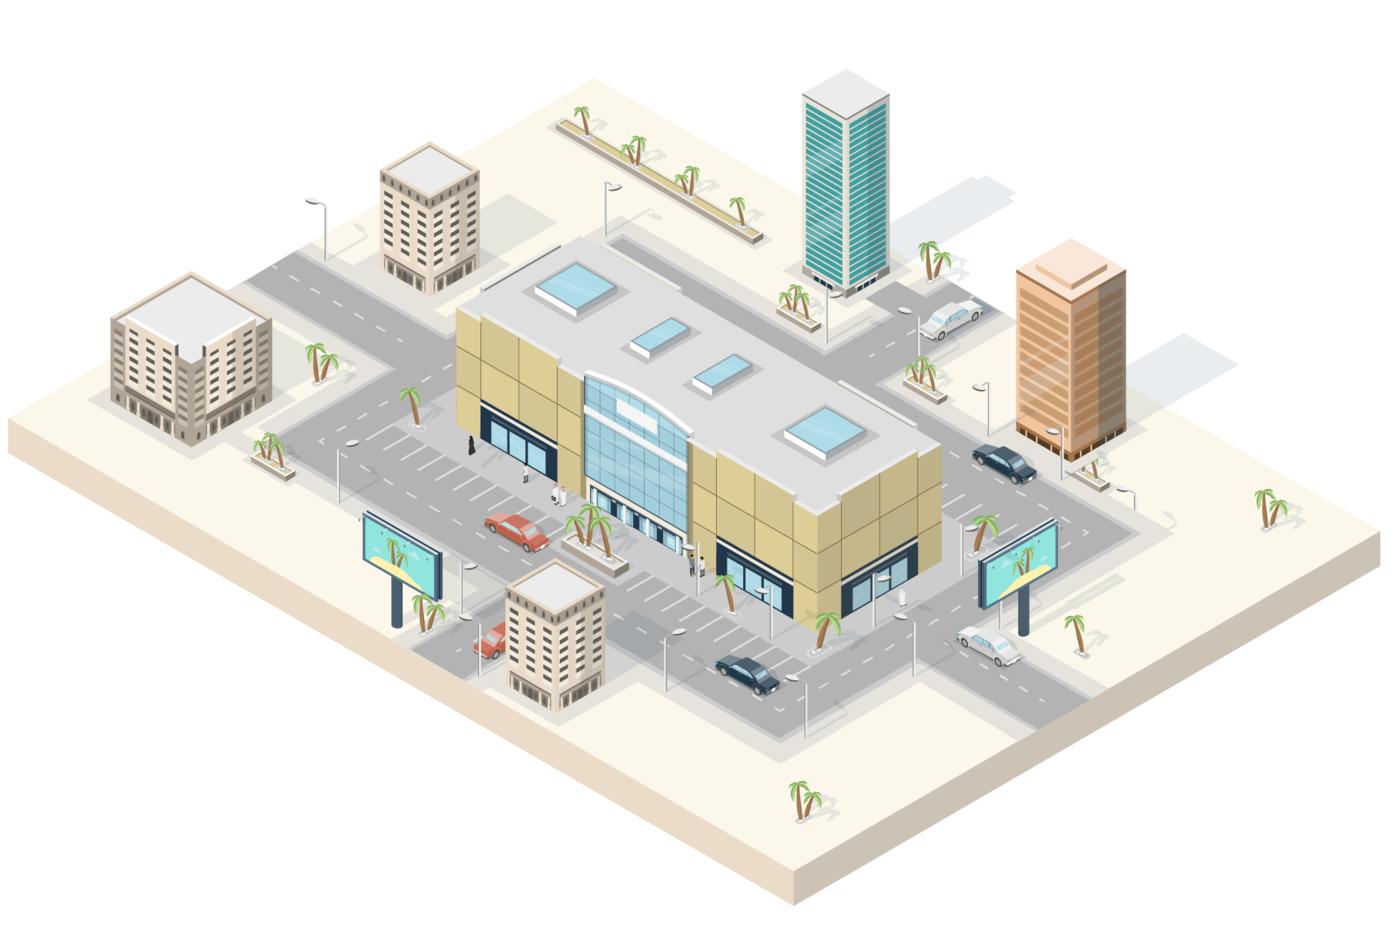 Smart Shopping Mall (IoT) by Dan Kindley at Coroflot com